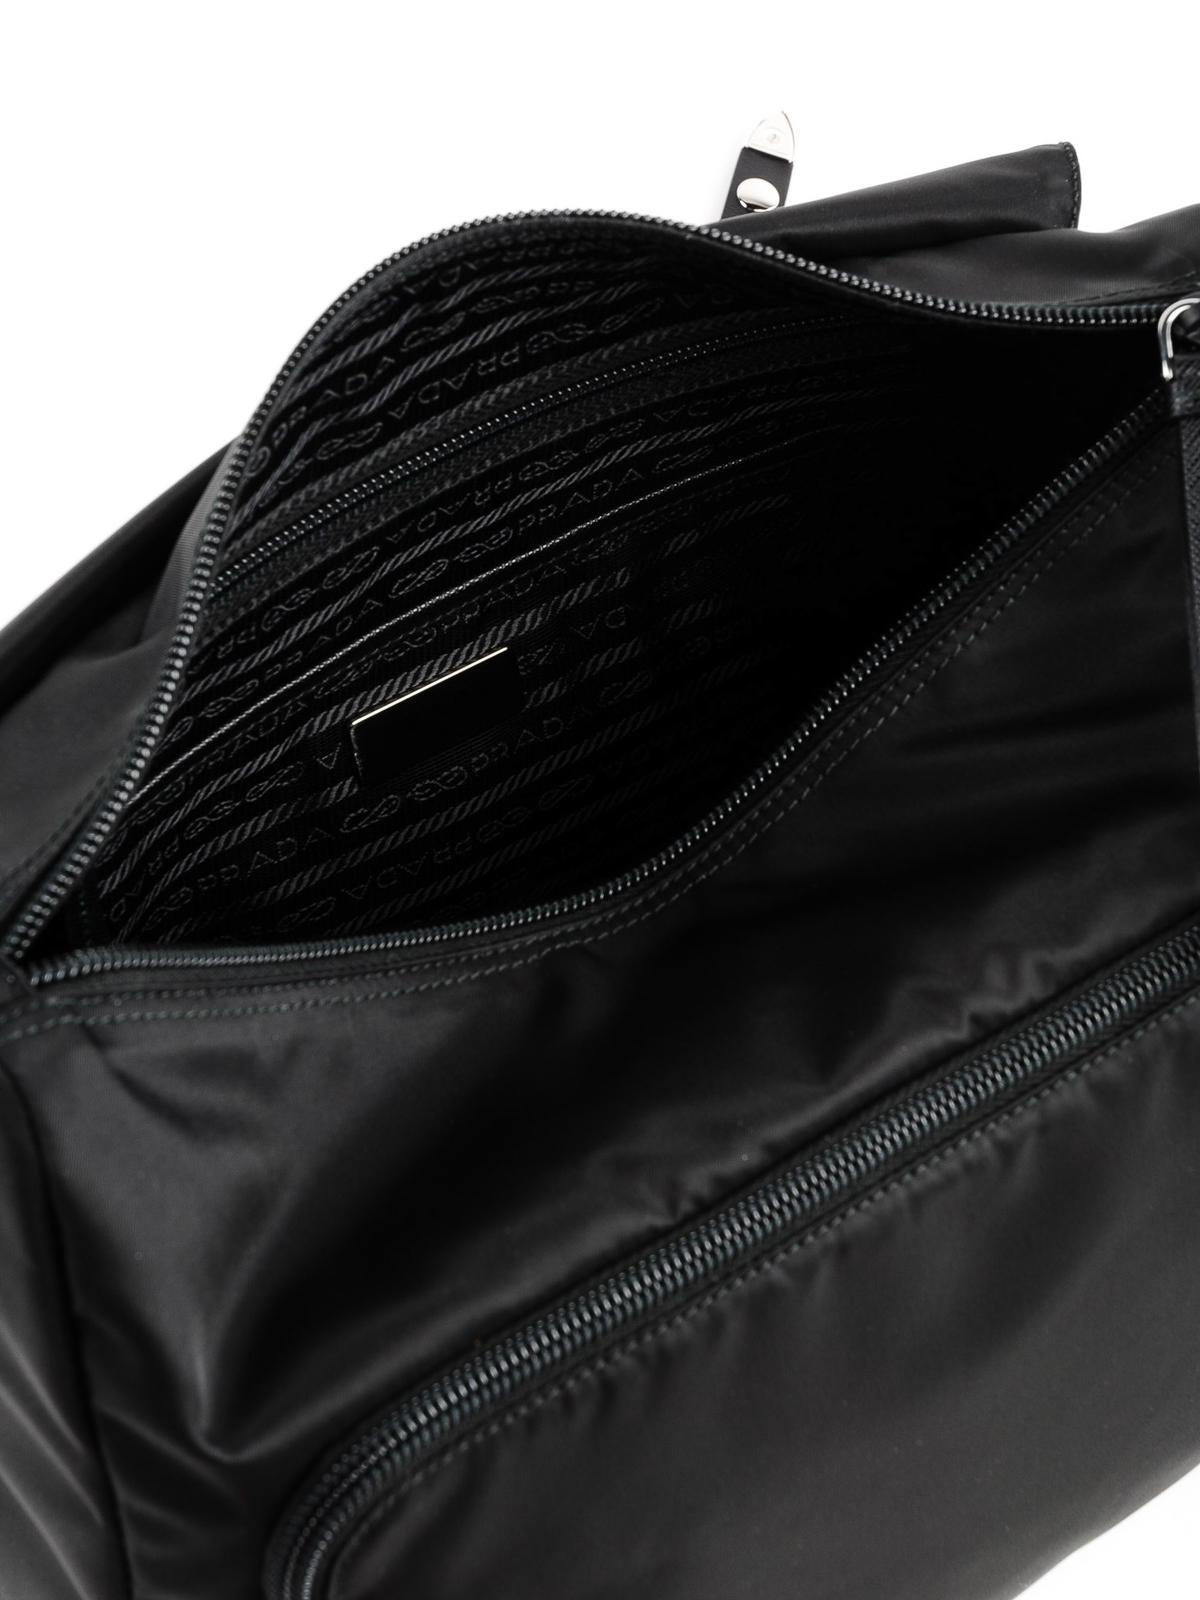 7acfad2d381184 Prada - Black nylon belt bag with silver studs - belt bags ...